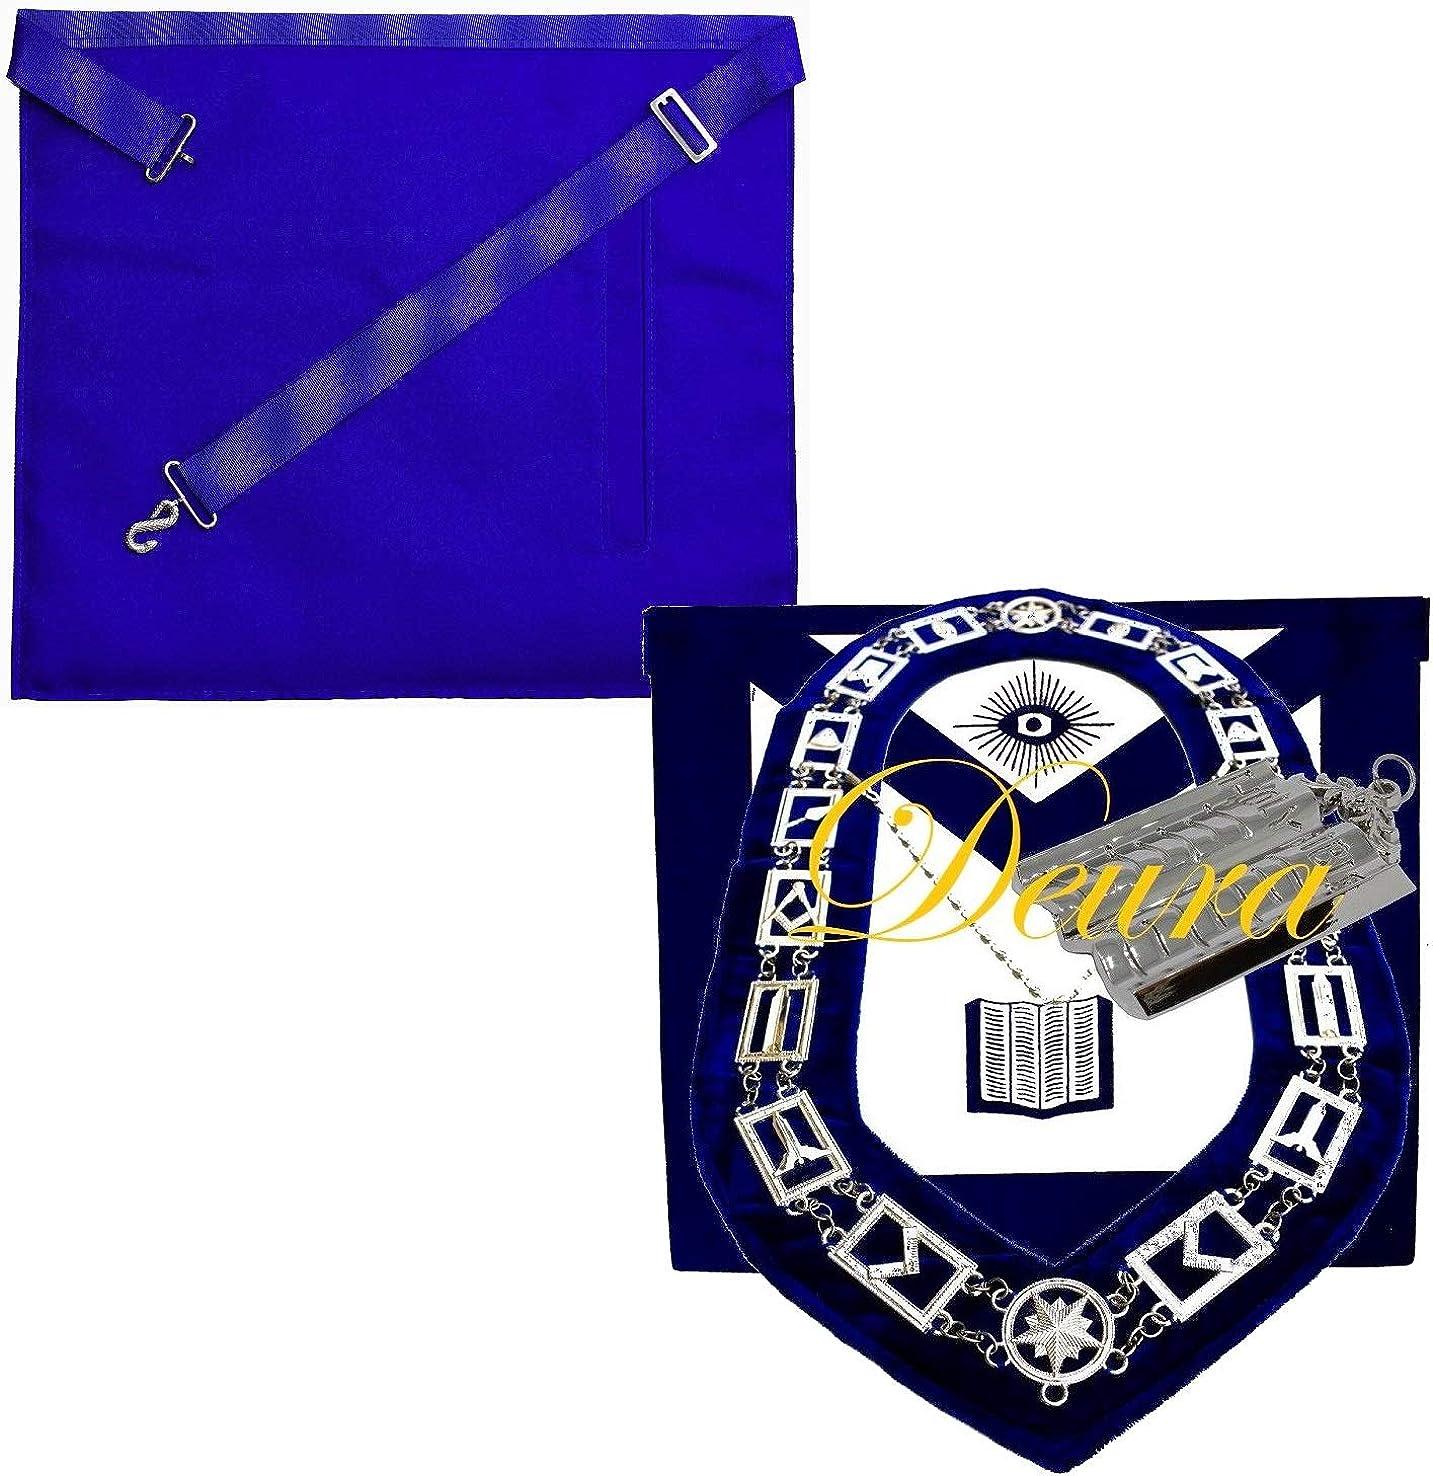 Masonic Master Mason CHAPLAIN HOLY BIBLE SILVER Jewel Collar EMBROIDERED Apron